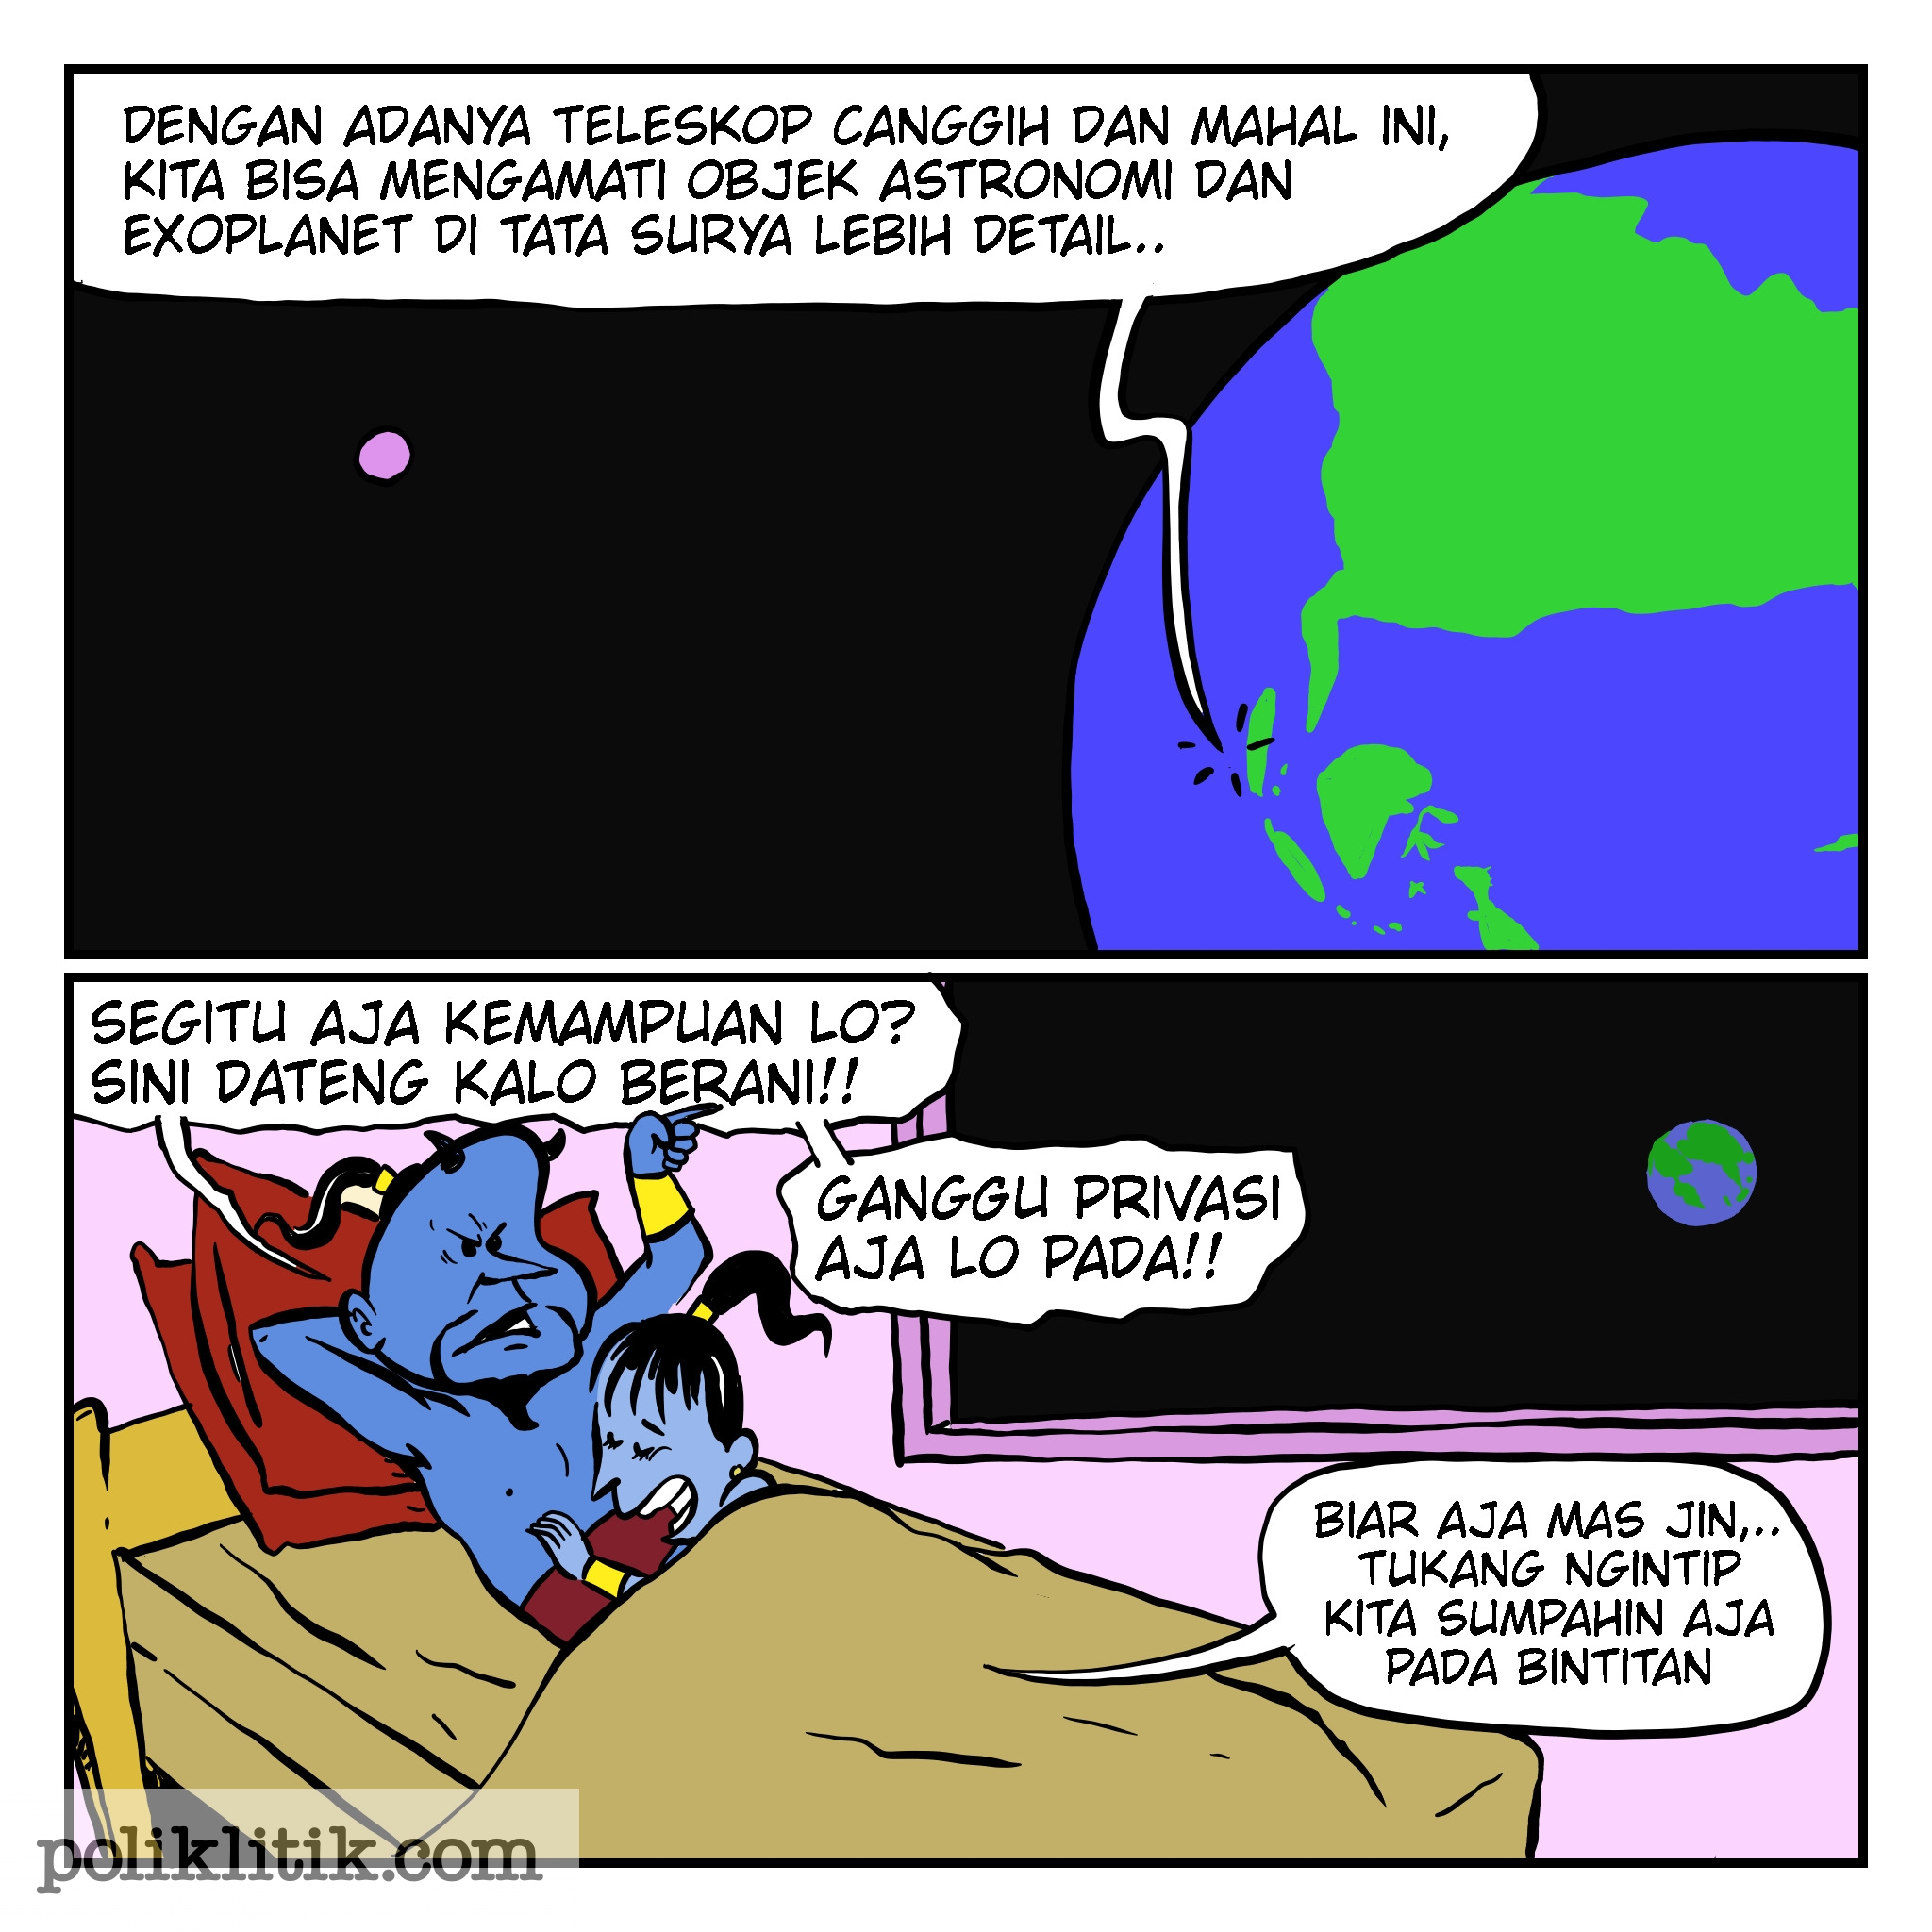 Mencari Exoplanet Disangka Alien